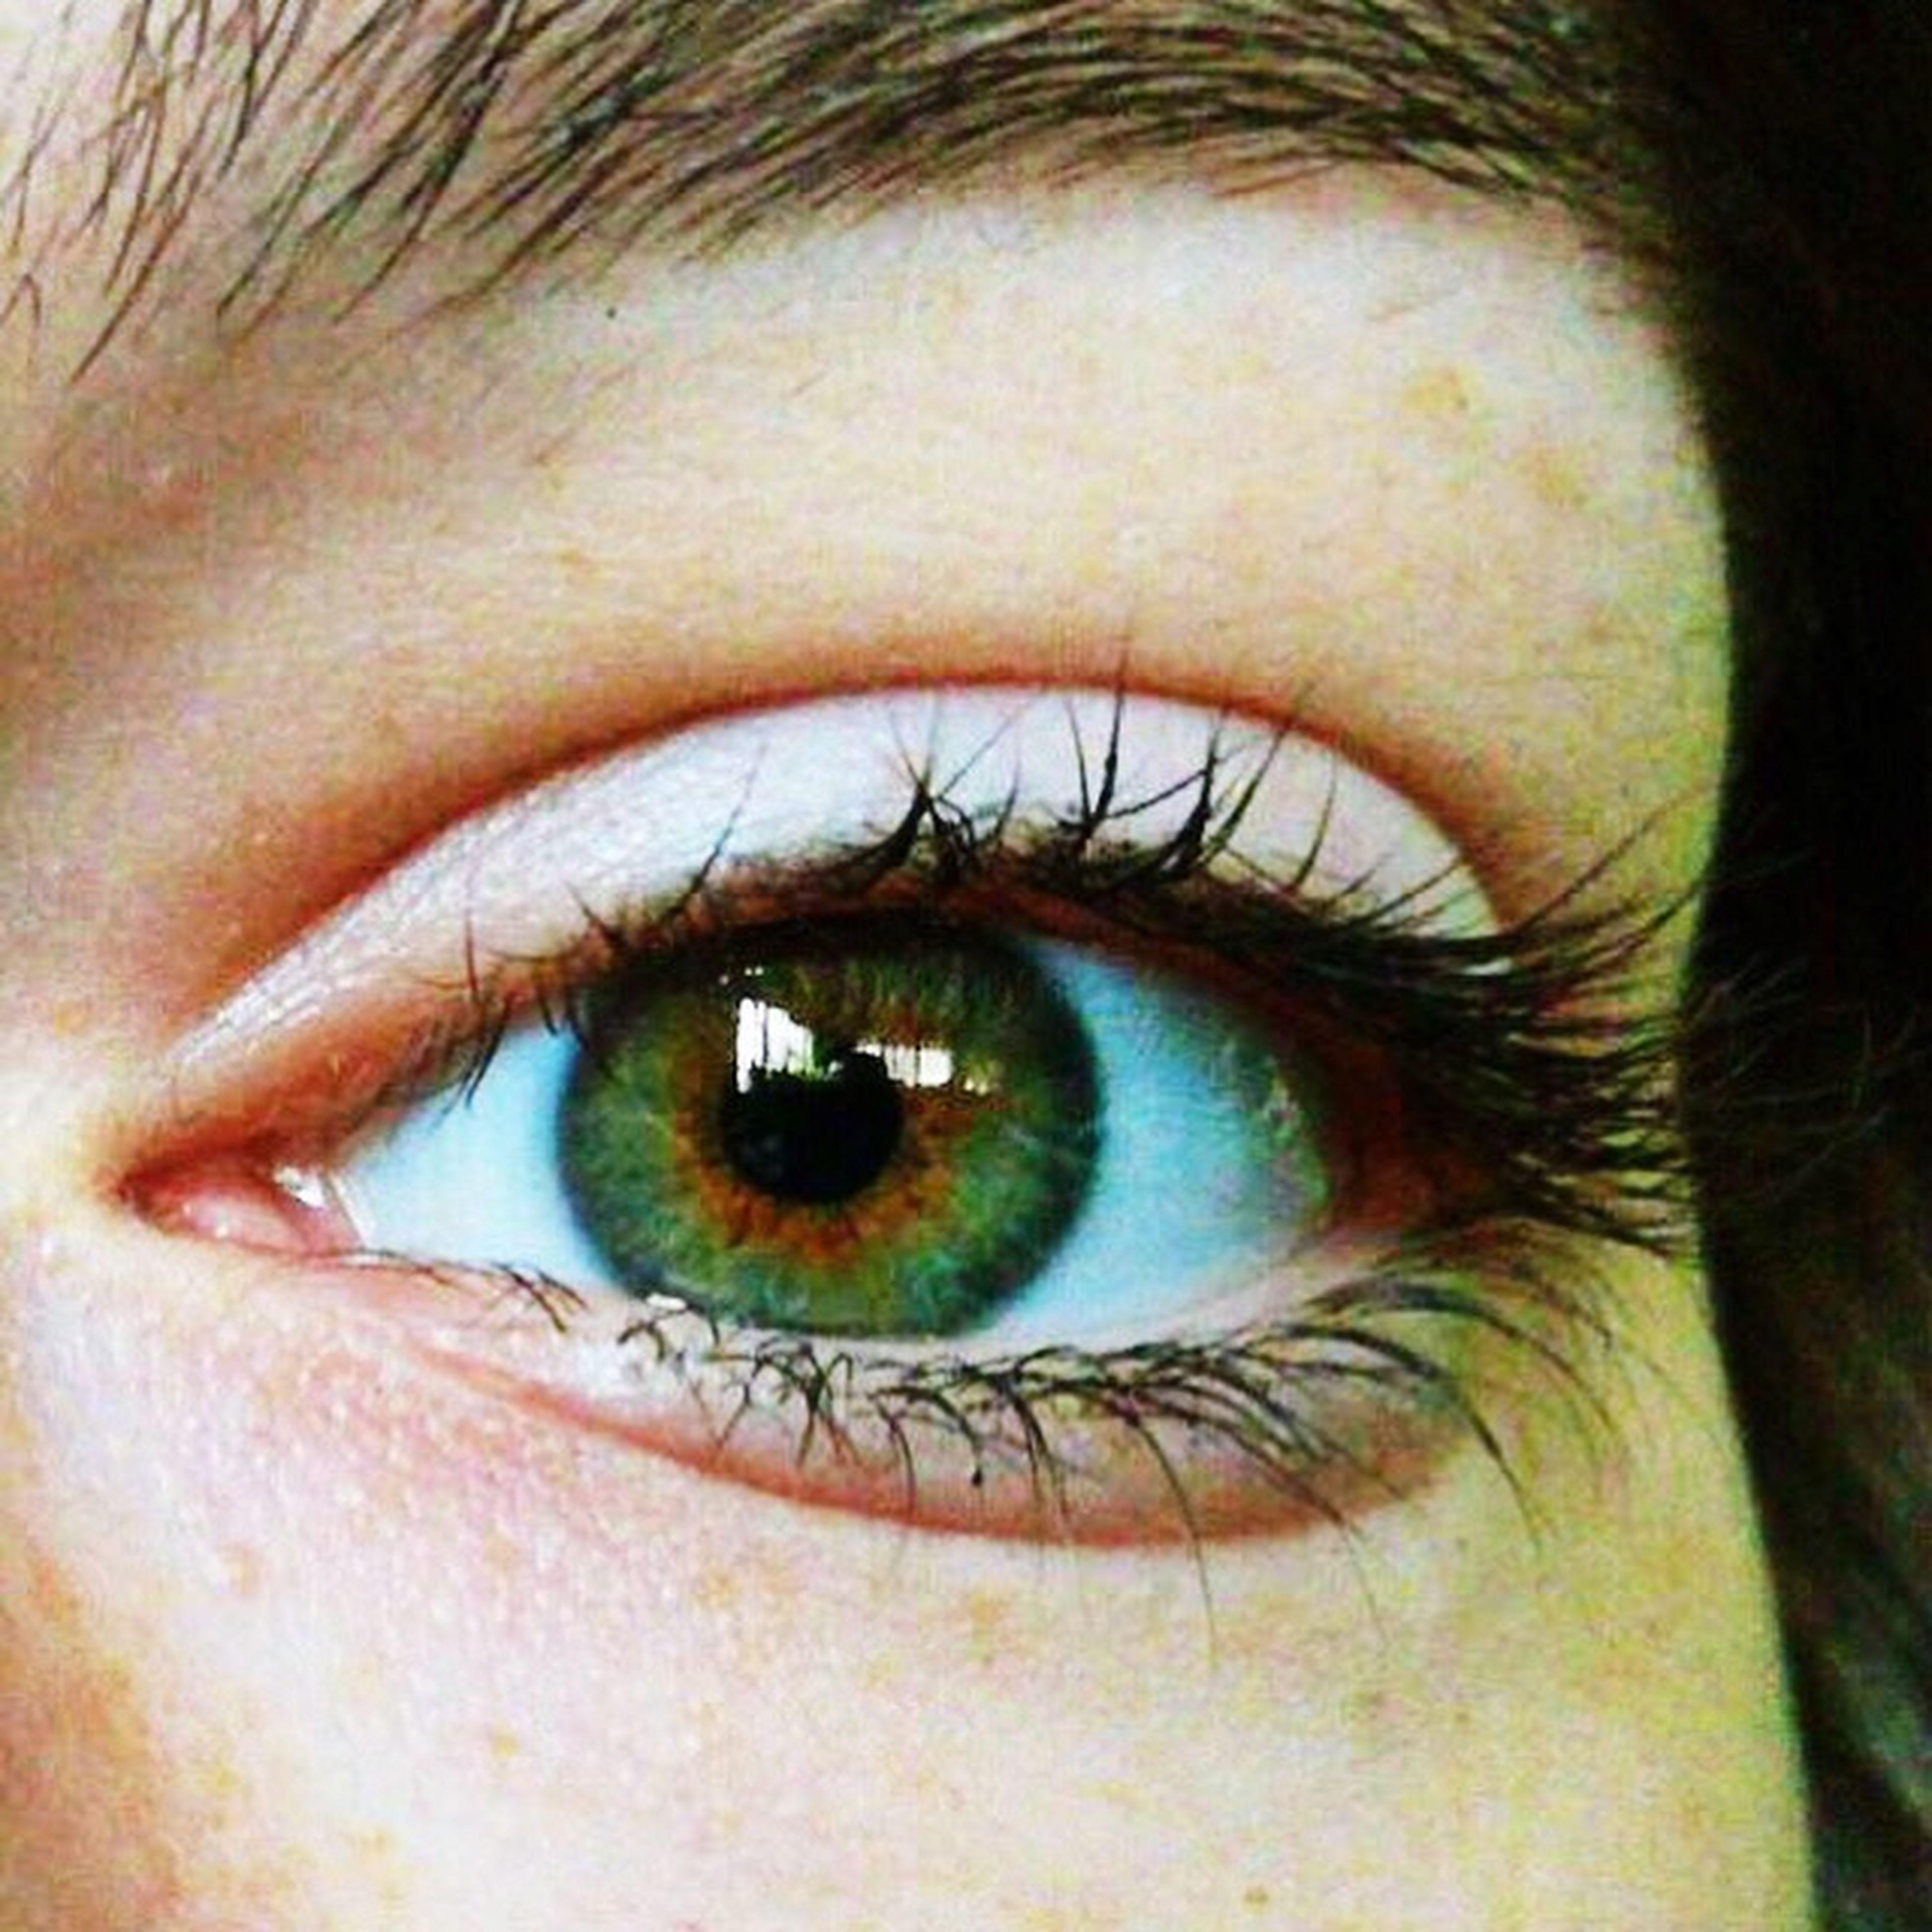 Human Eye Eyelash Looking At Camera Eyeball Close-up Human Body Part Eyebrow Eyesight Iris - Eye One Person Real People Portrait Sensory Perception Indoors  Day Adult People Heterochromia Green Eyes Blue